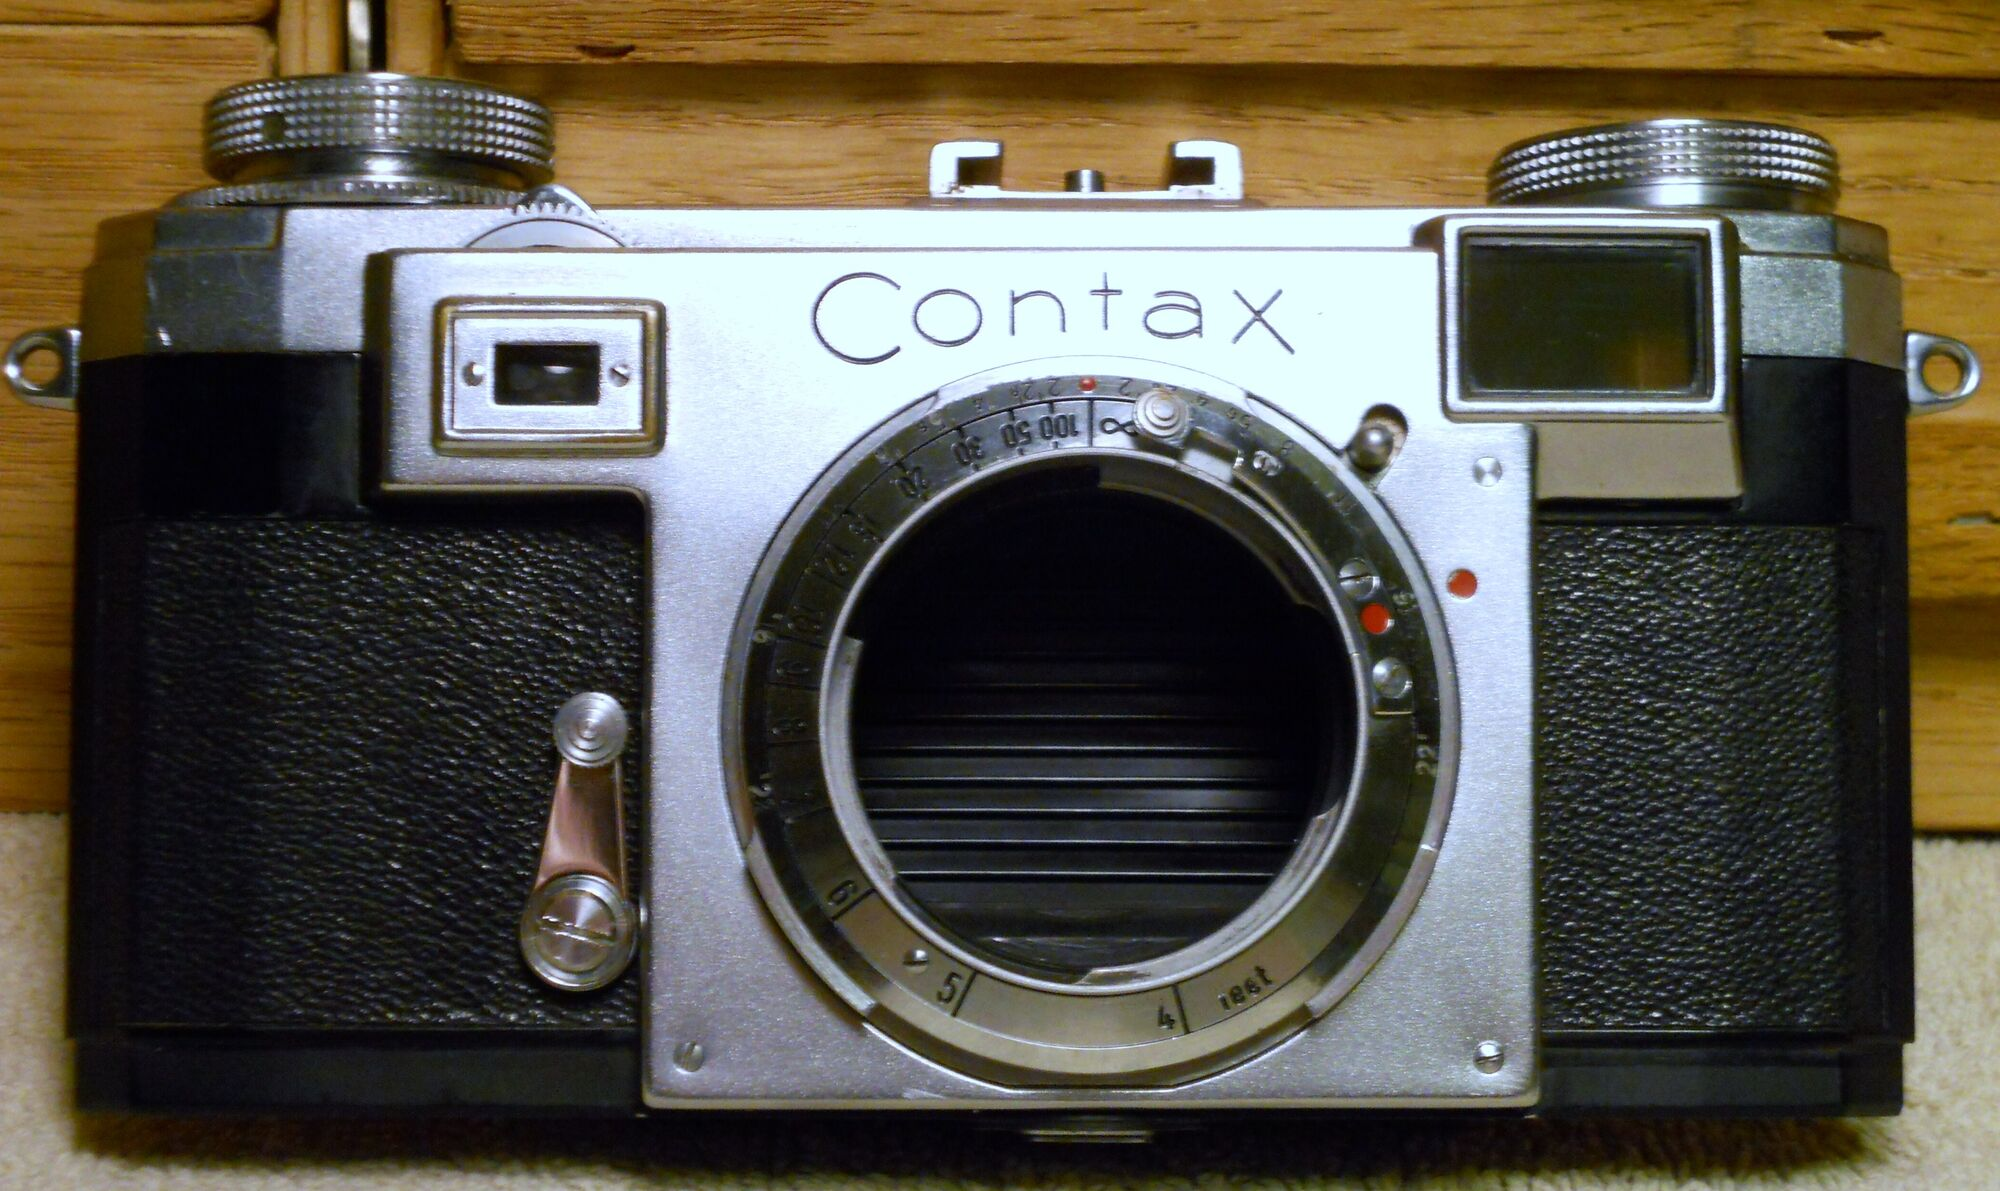 Contax rangefinder | Camerapedia | FANDOM powered by Wikia